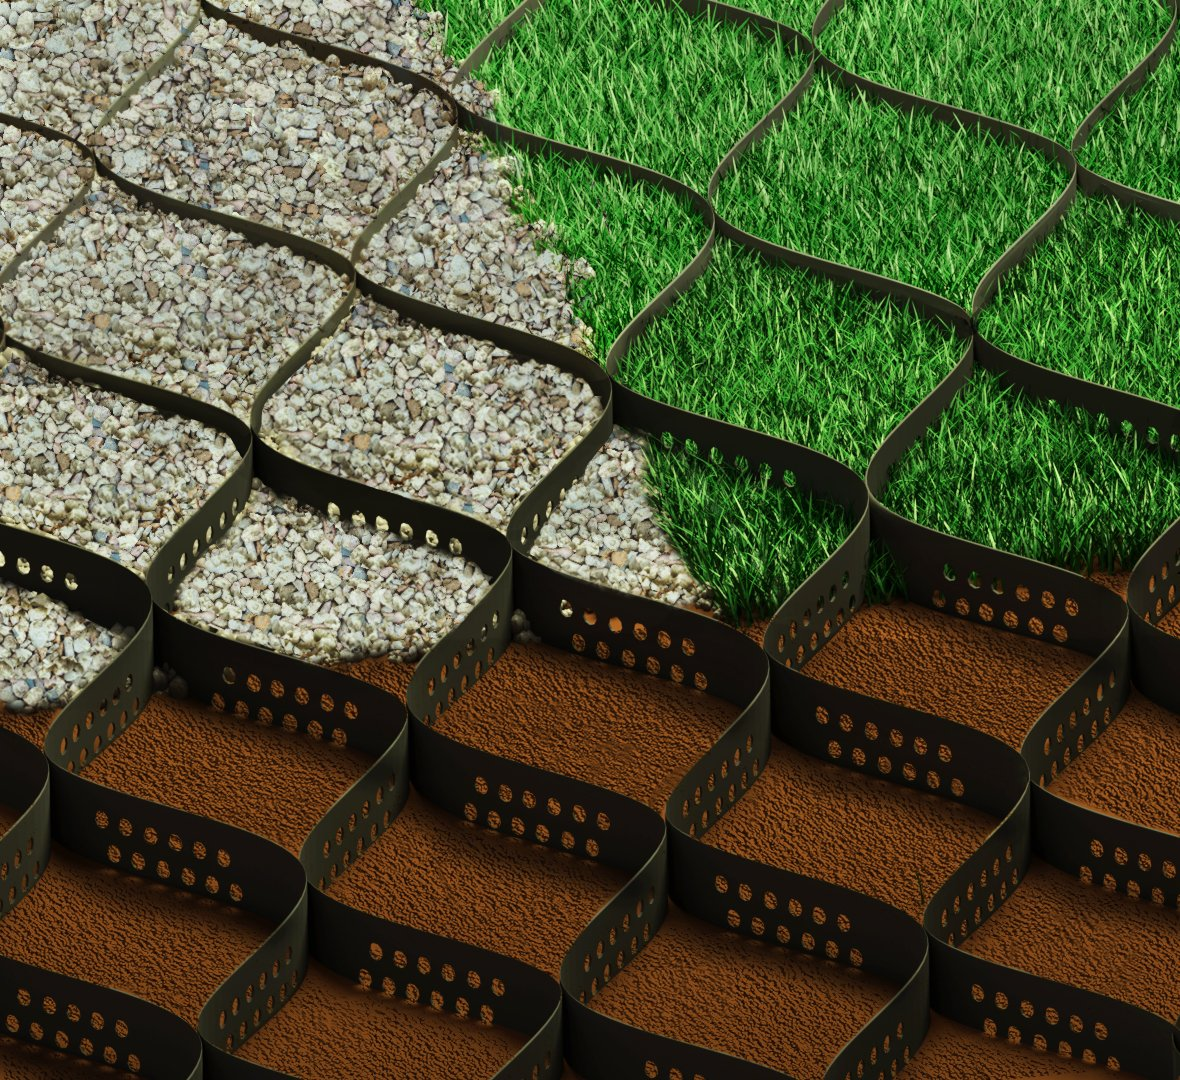 Standartpark 2'' Thick Geo Grid Ground Grid Polyethylene 160 sq ft 1885 LBS per sq ft strength